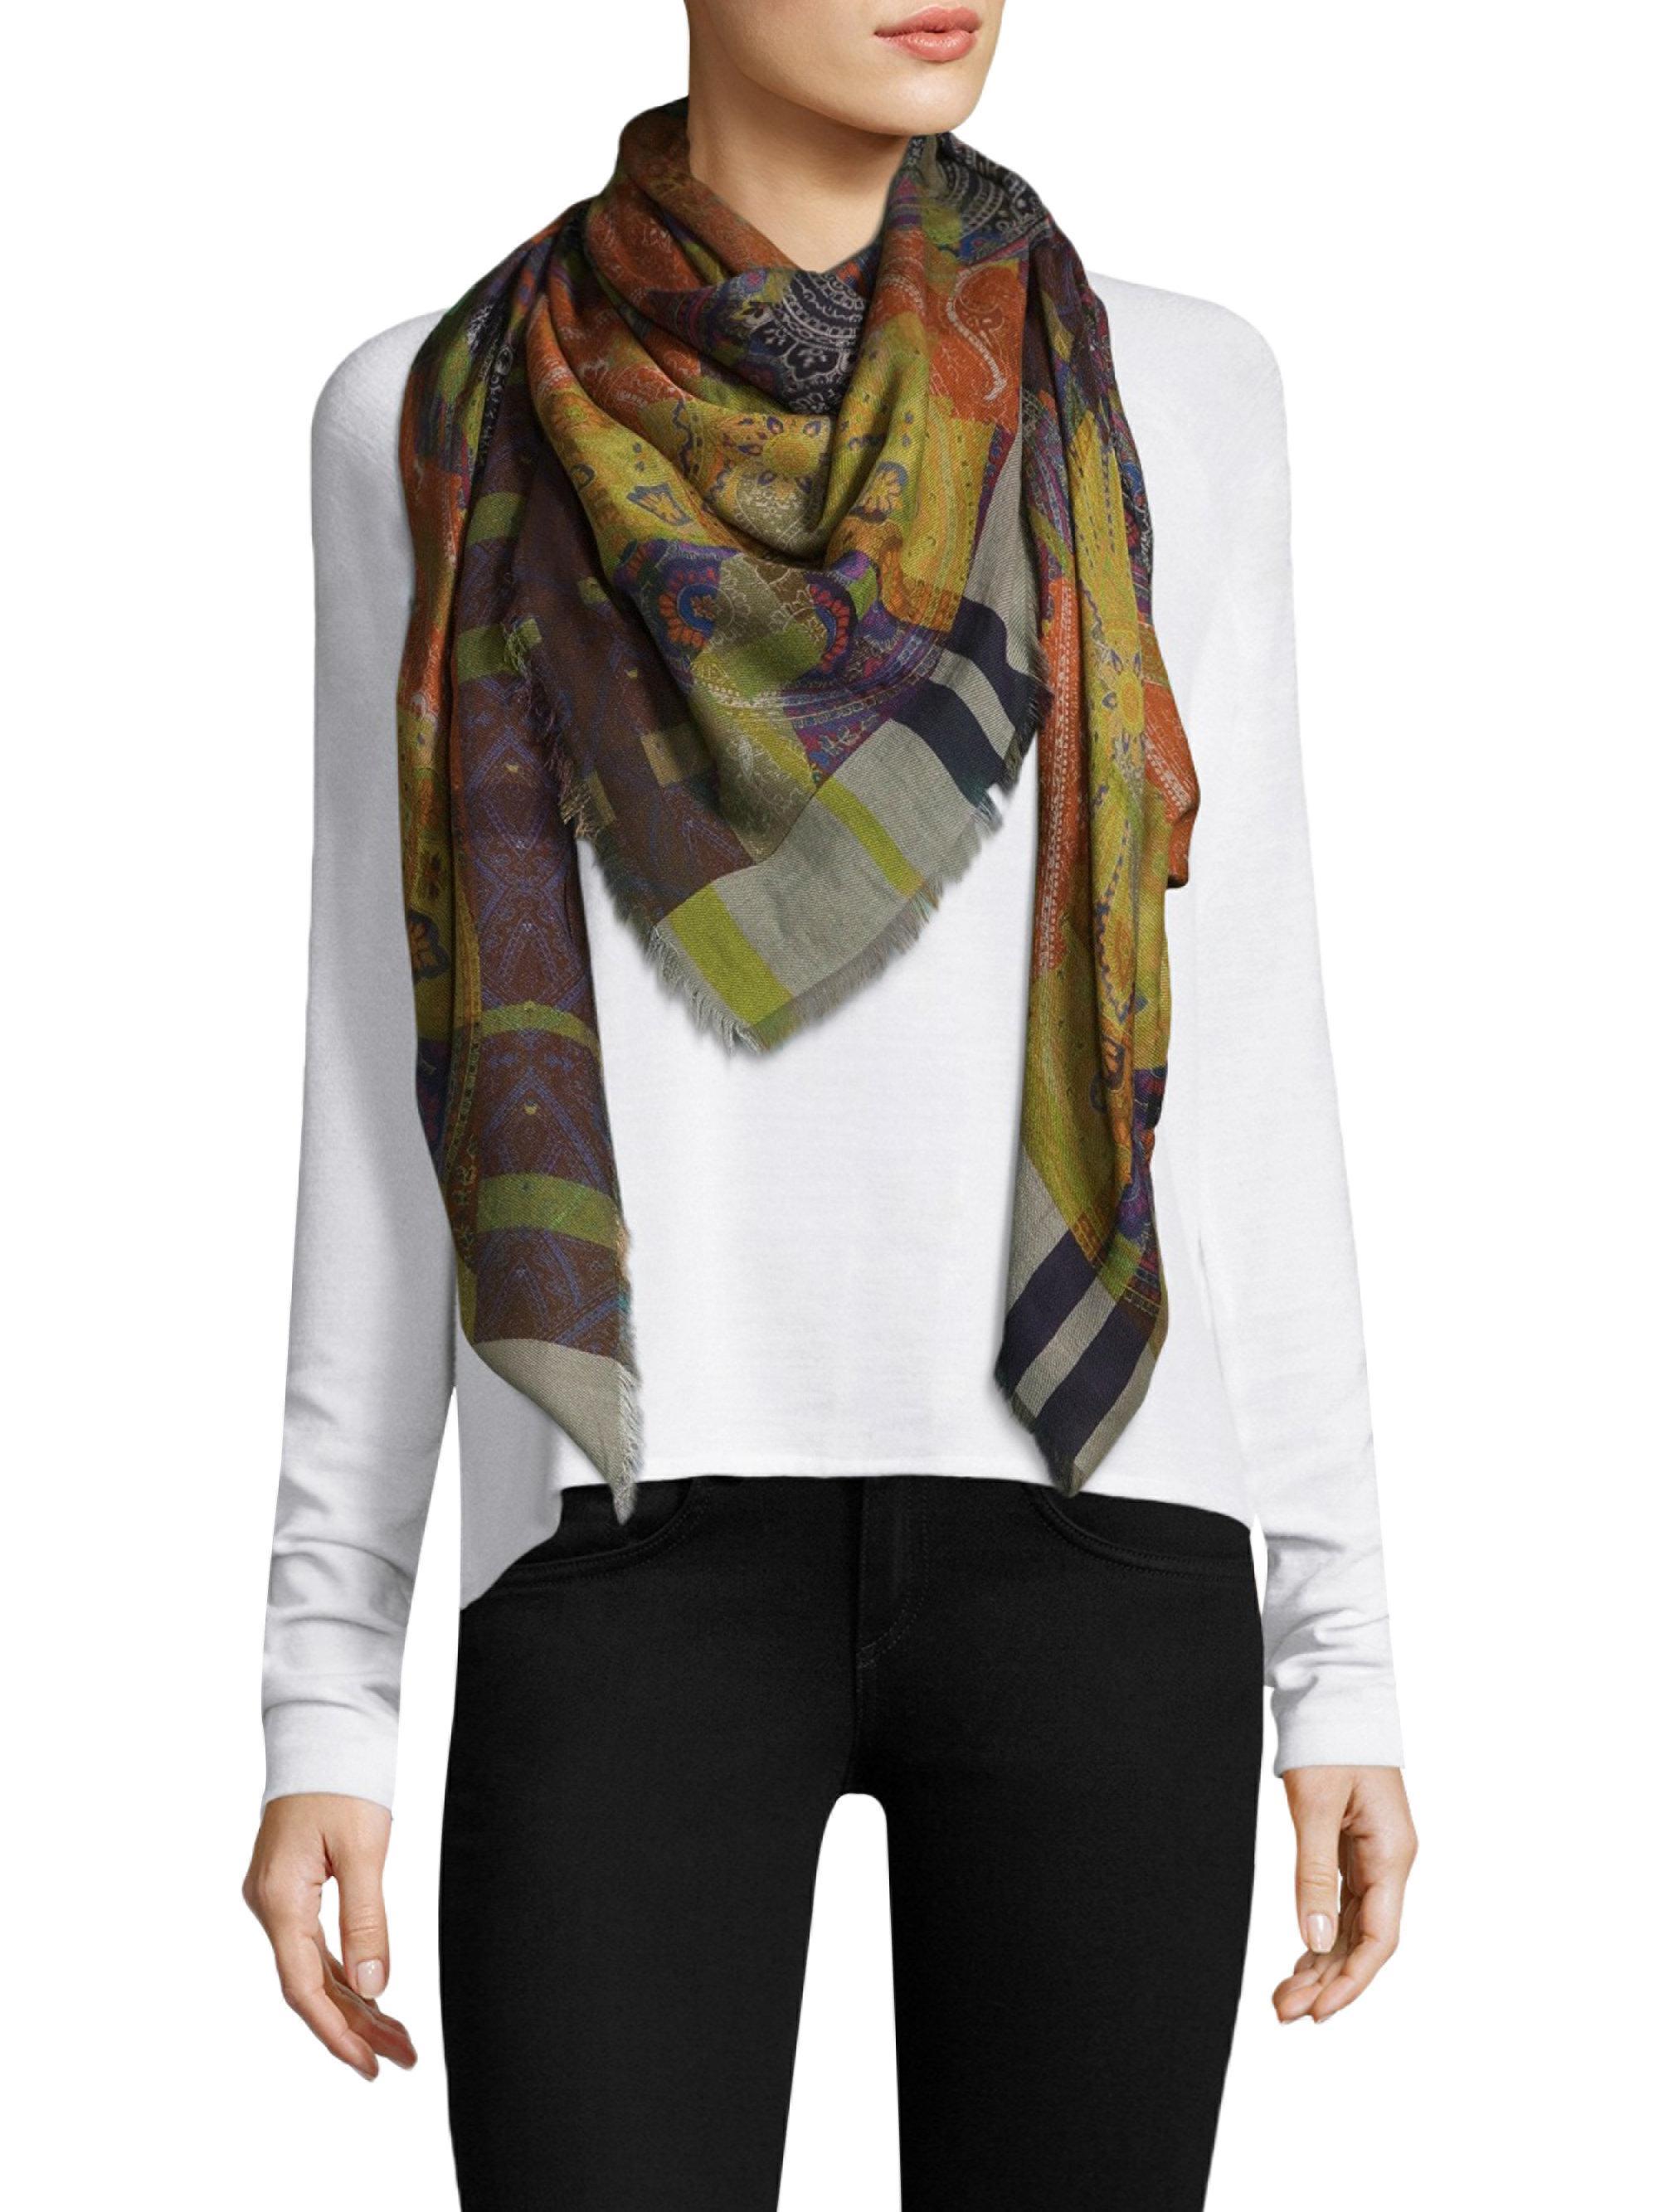 ferrari floral lyst butterfly multi scarf gallery product silk normal salvatore black accessories franco ferragamo